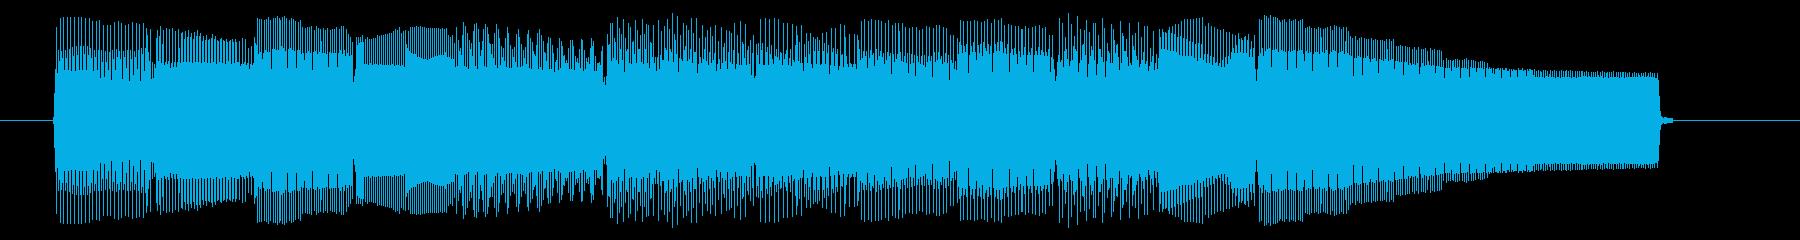 NES レース A05-2(クリア2)の再生済みの波形